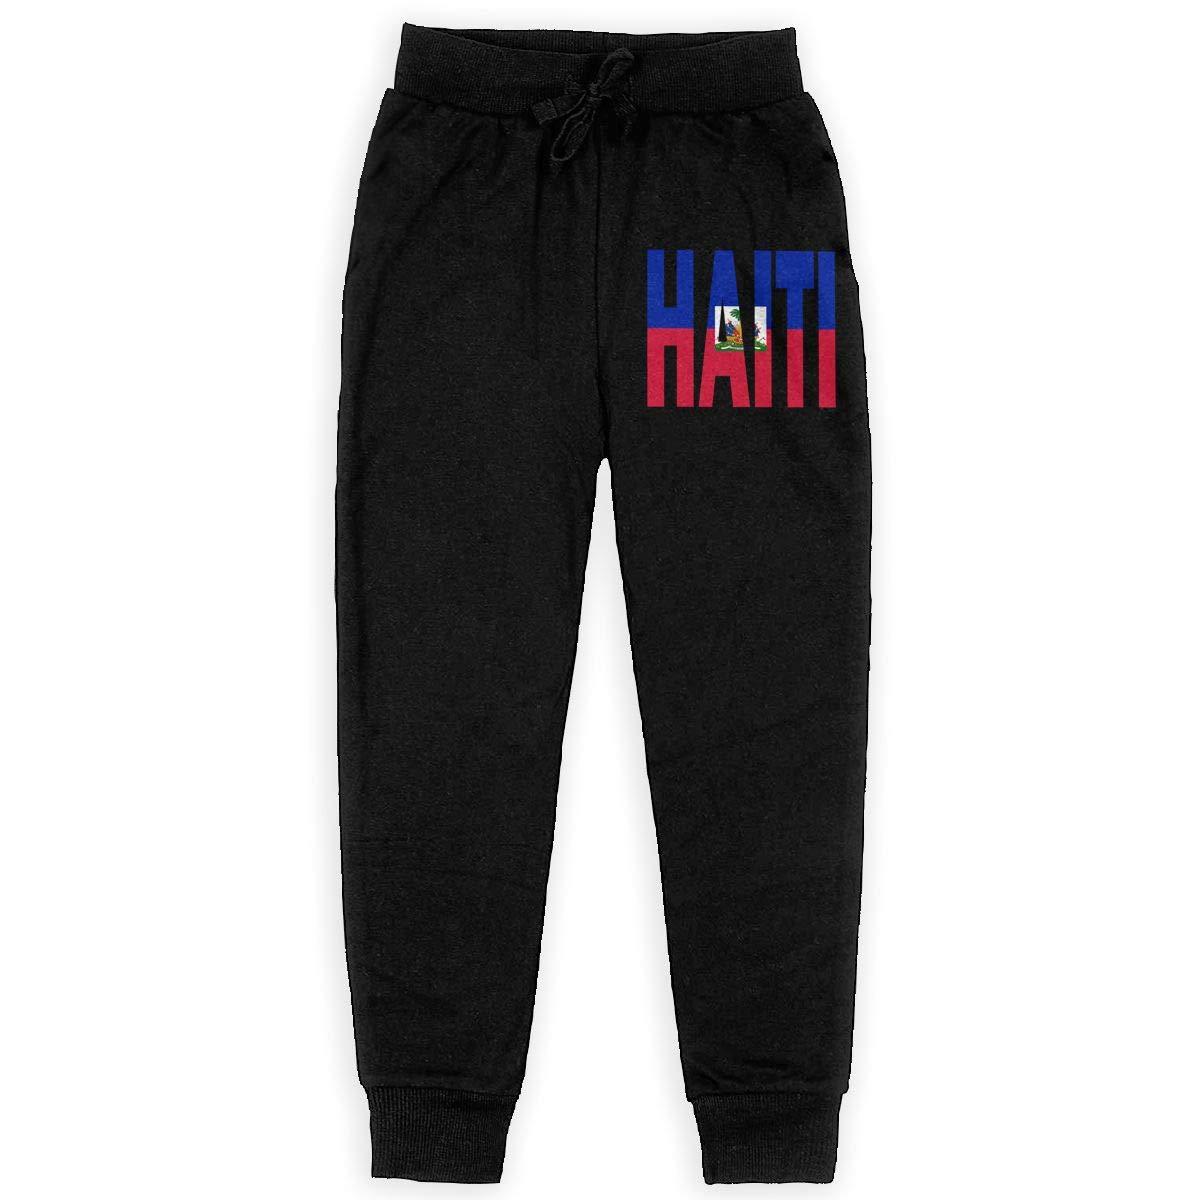 WYZVK22 Haiti Flag Soft//Cozy Sweatpants Boys Athletic Pants Teenager Boys